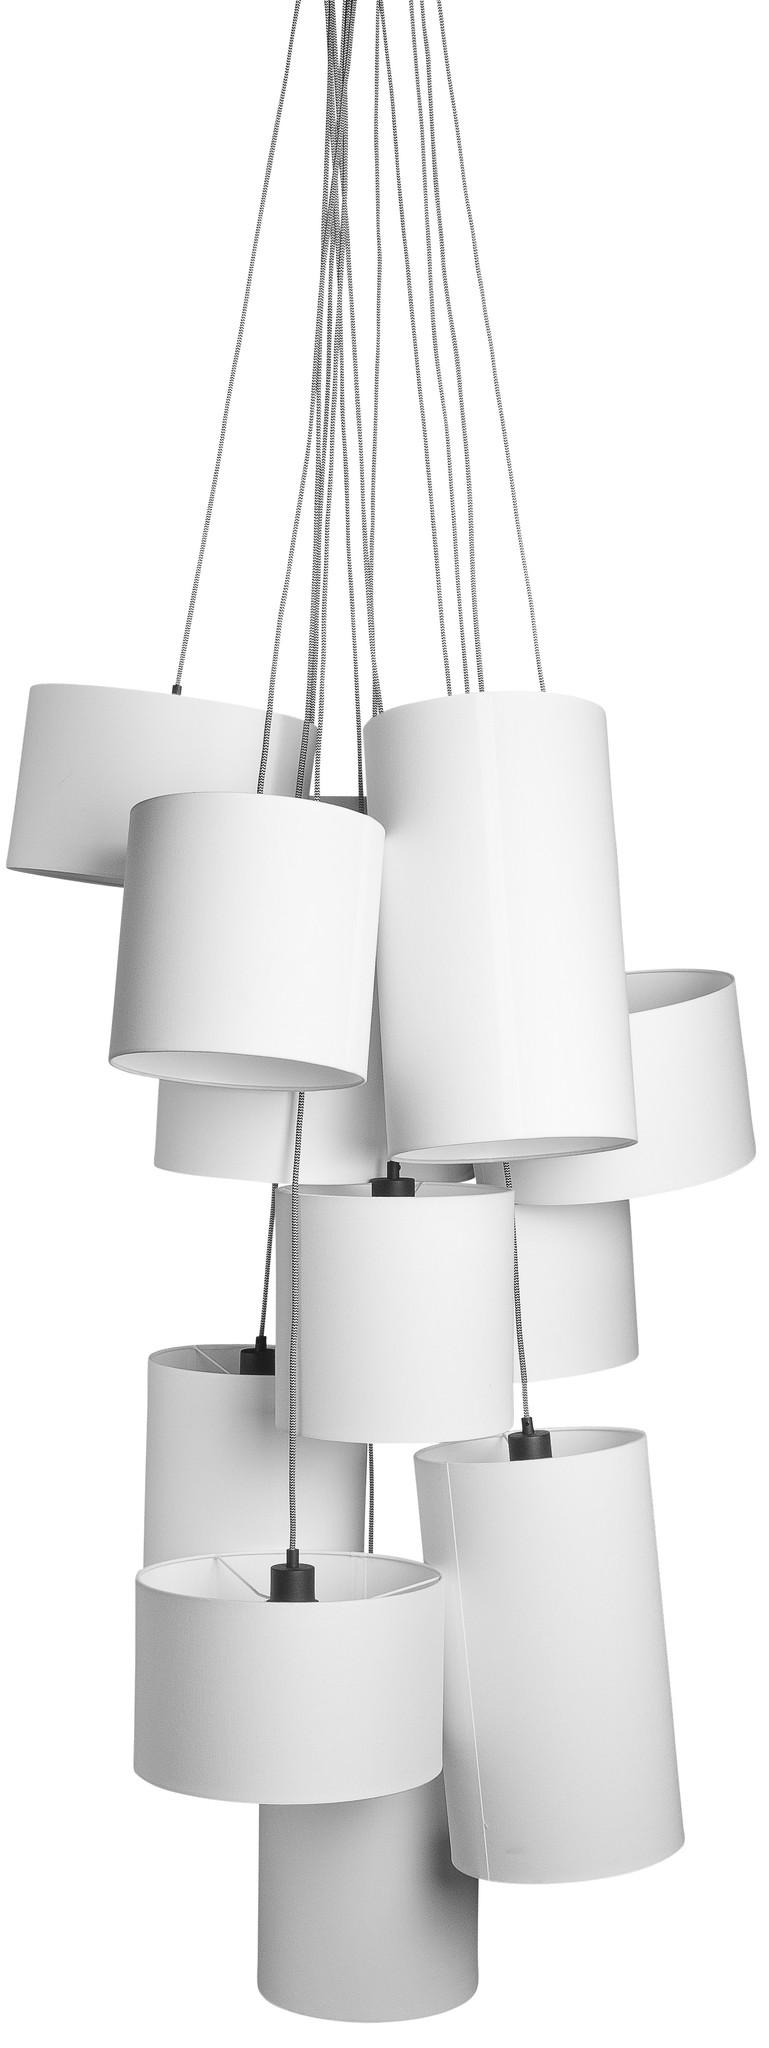 Hanglamp Oslo 12 lampen textil smokey grey-1